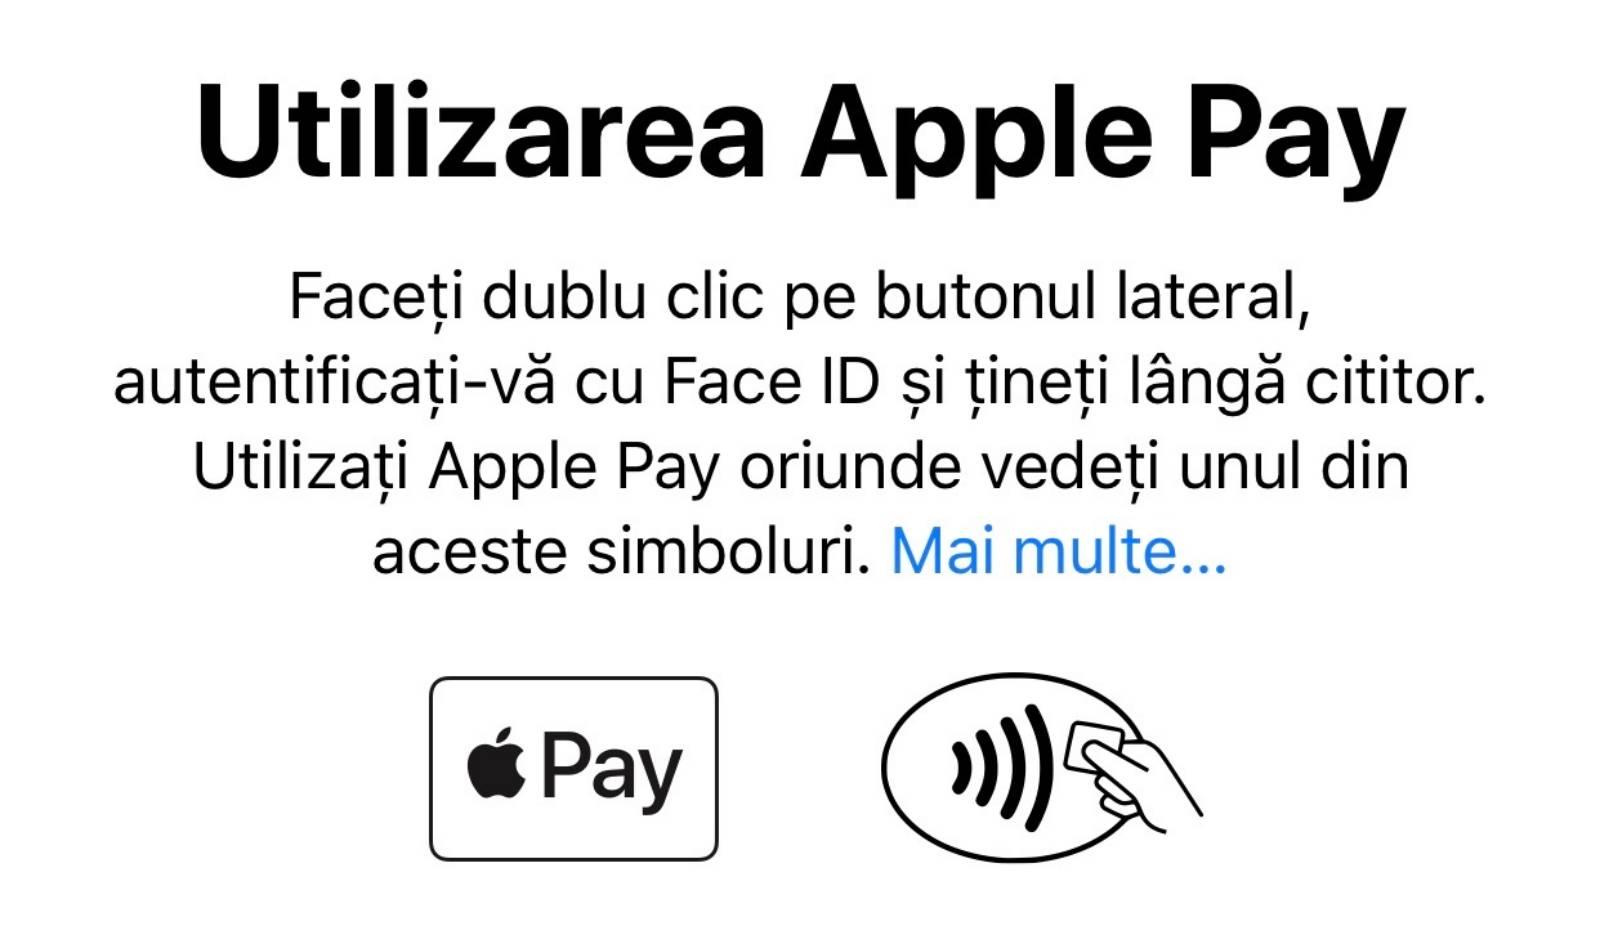 adaugi card apple pay iphone ipad